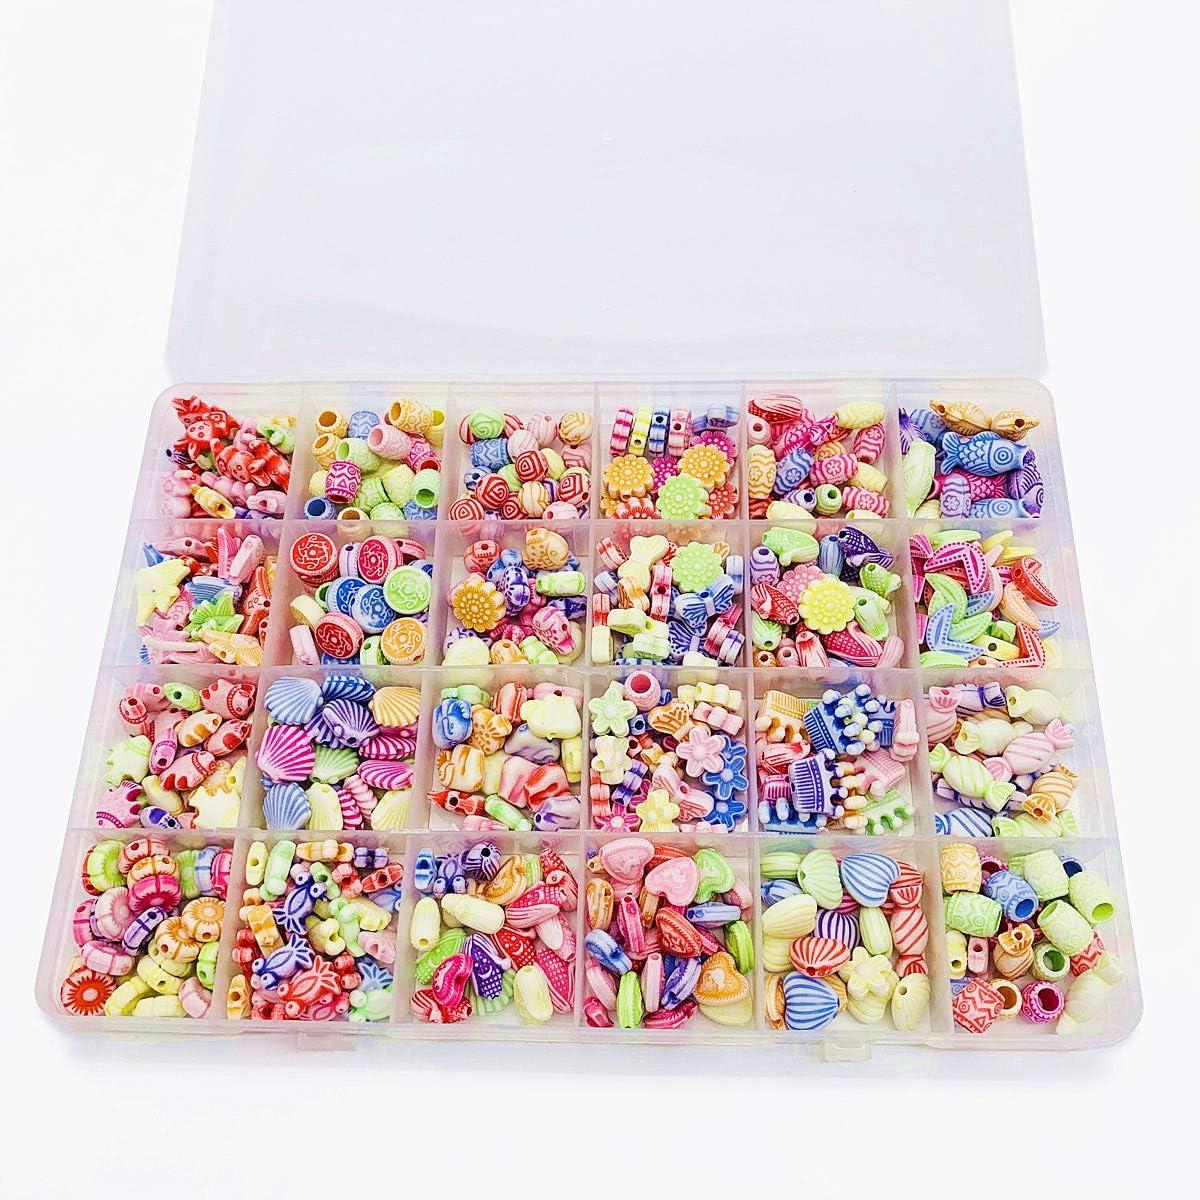 Bracelet Making Kit Gift Kit for Girls EFAILY 600 Pcs Children DIY Beads Set,A DIY Jewelry Bead Kit for Making Bracelets Necklaces